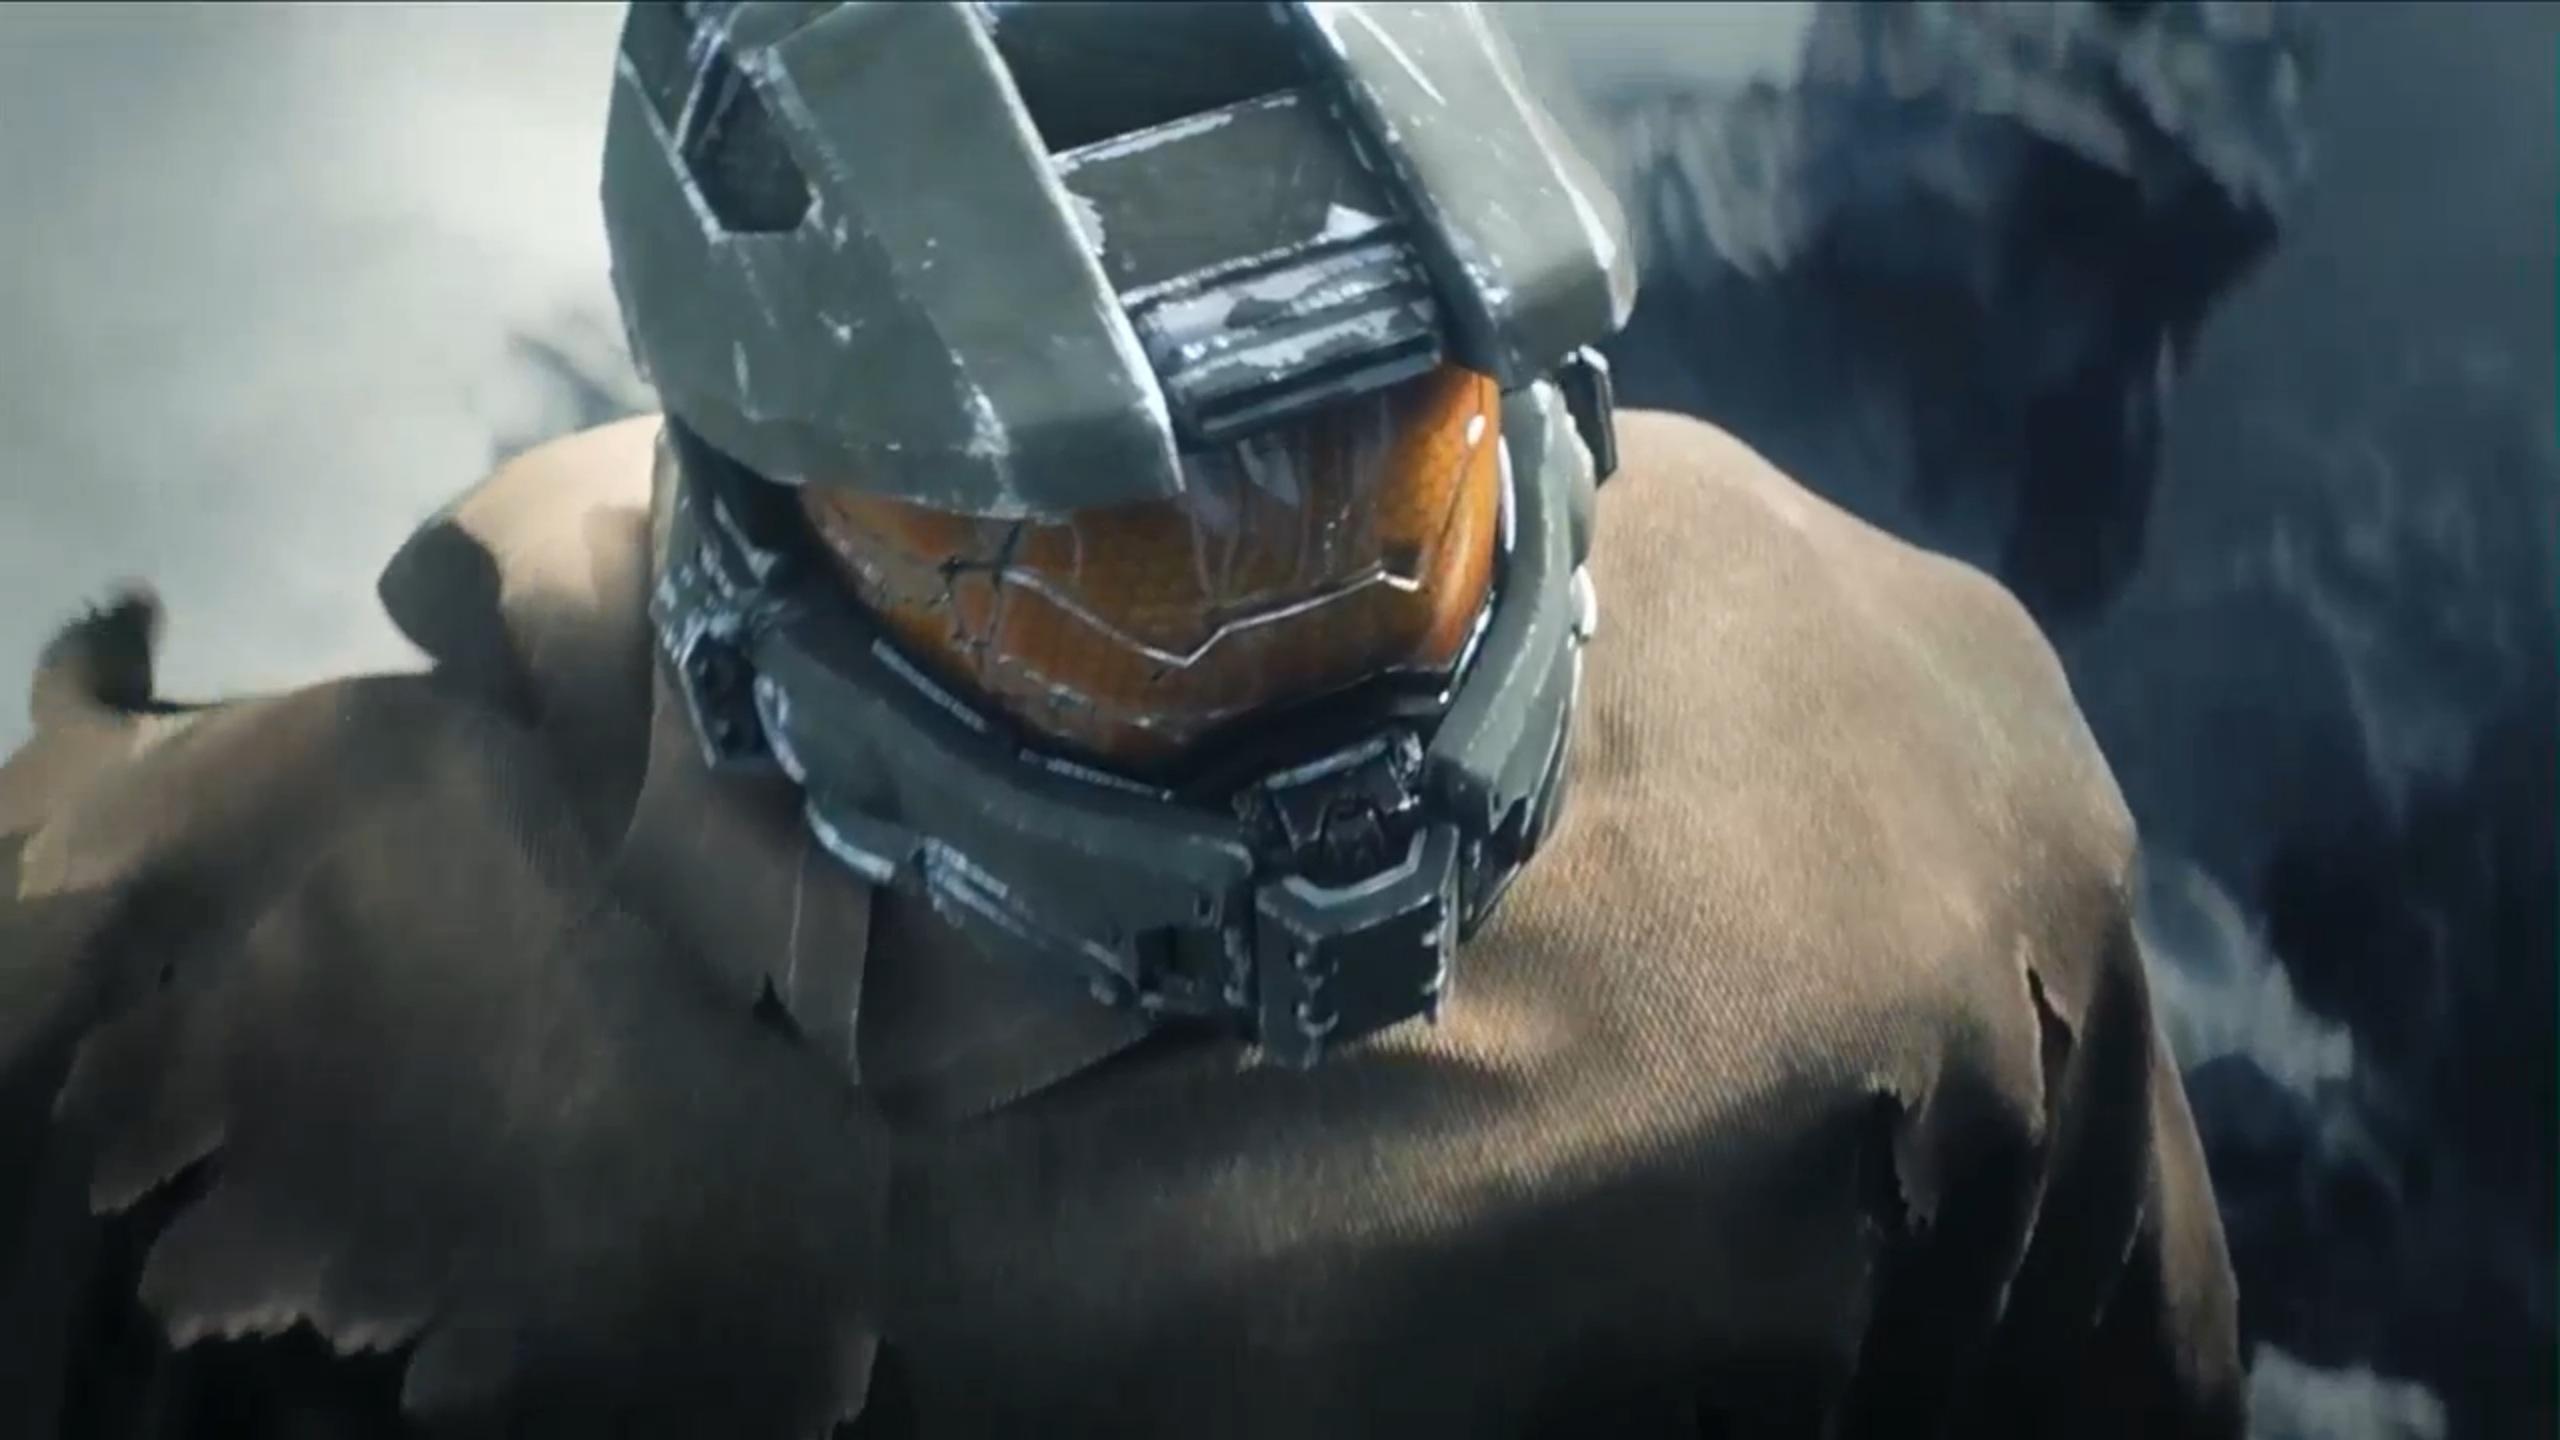 Halo 5 Wallpaper Xbox One 2560x1440